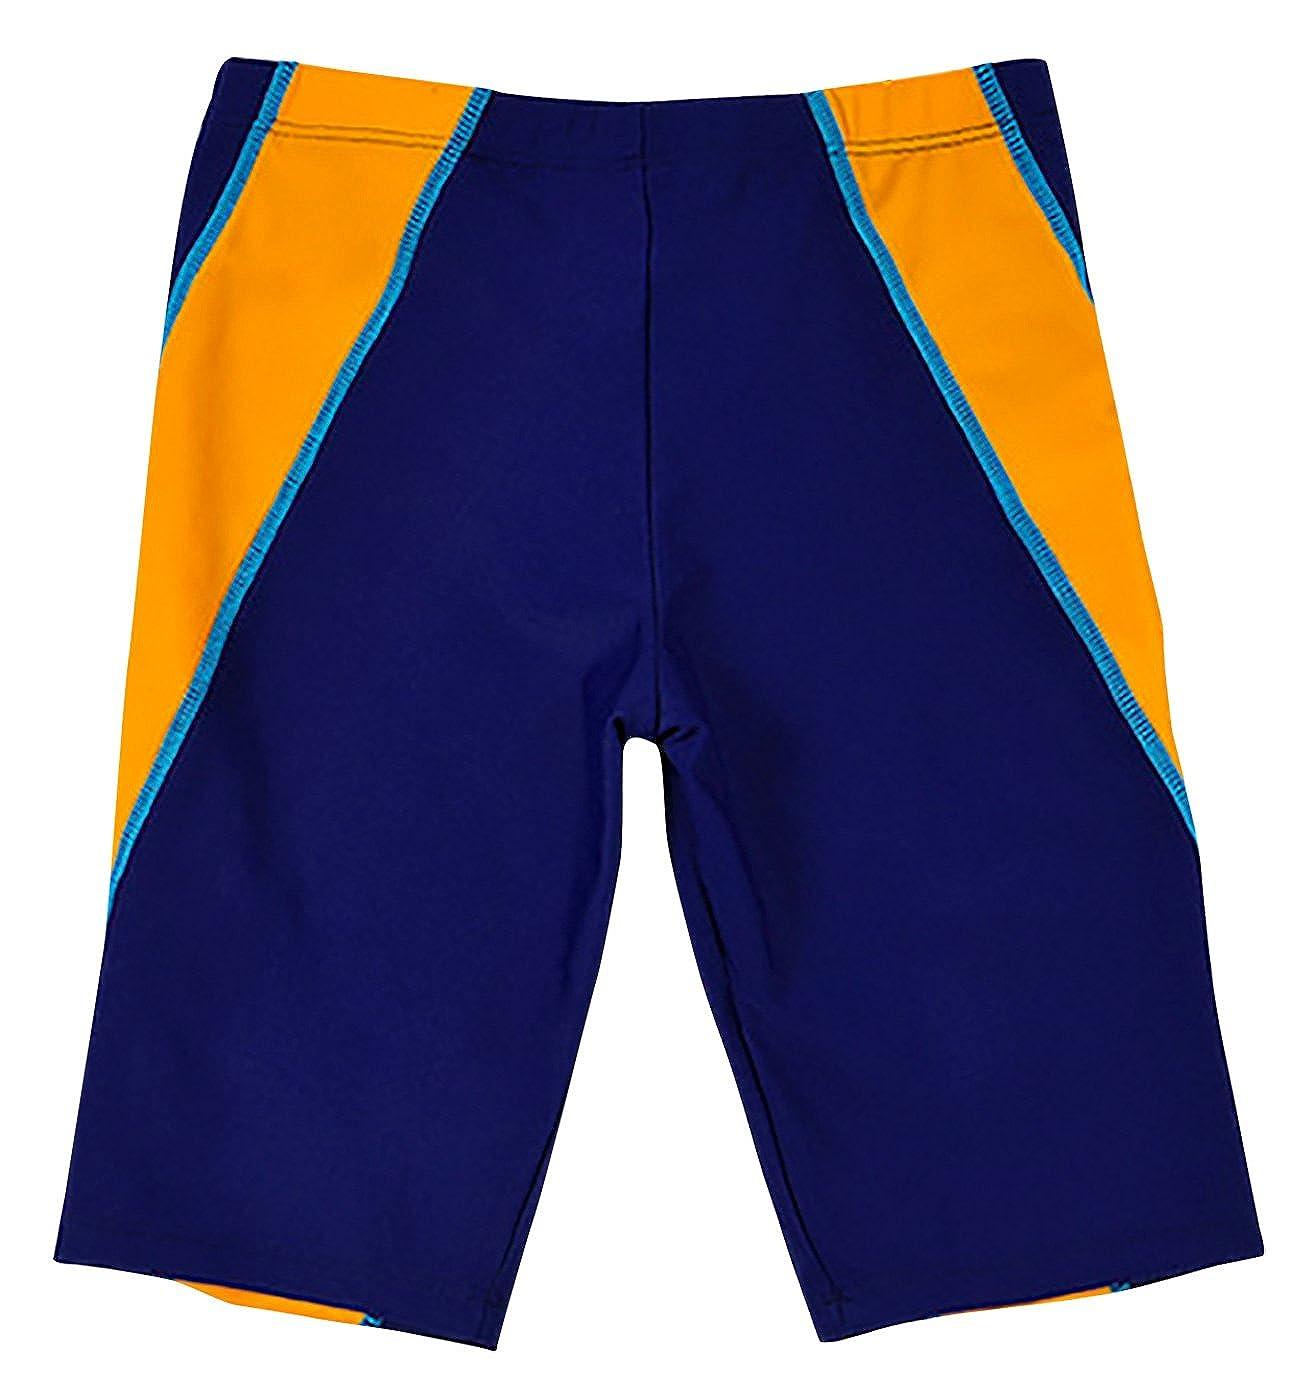 Aivtalk Kid Boys Cartoon Printed Swim Shorts Jammer Swimwear